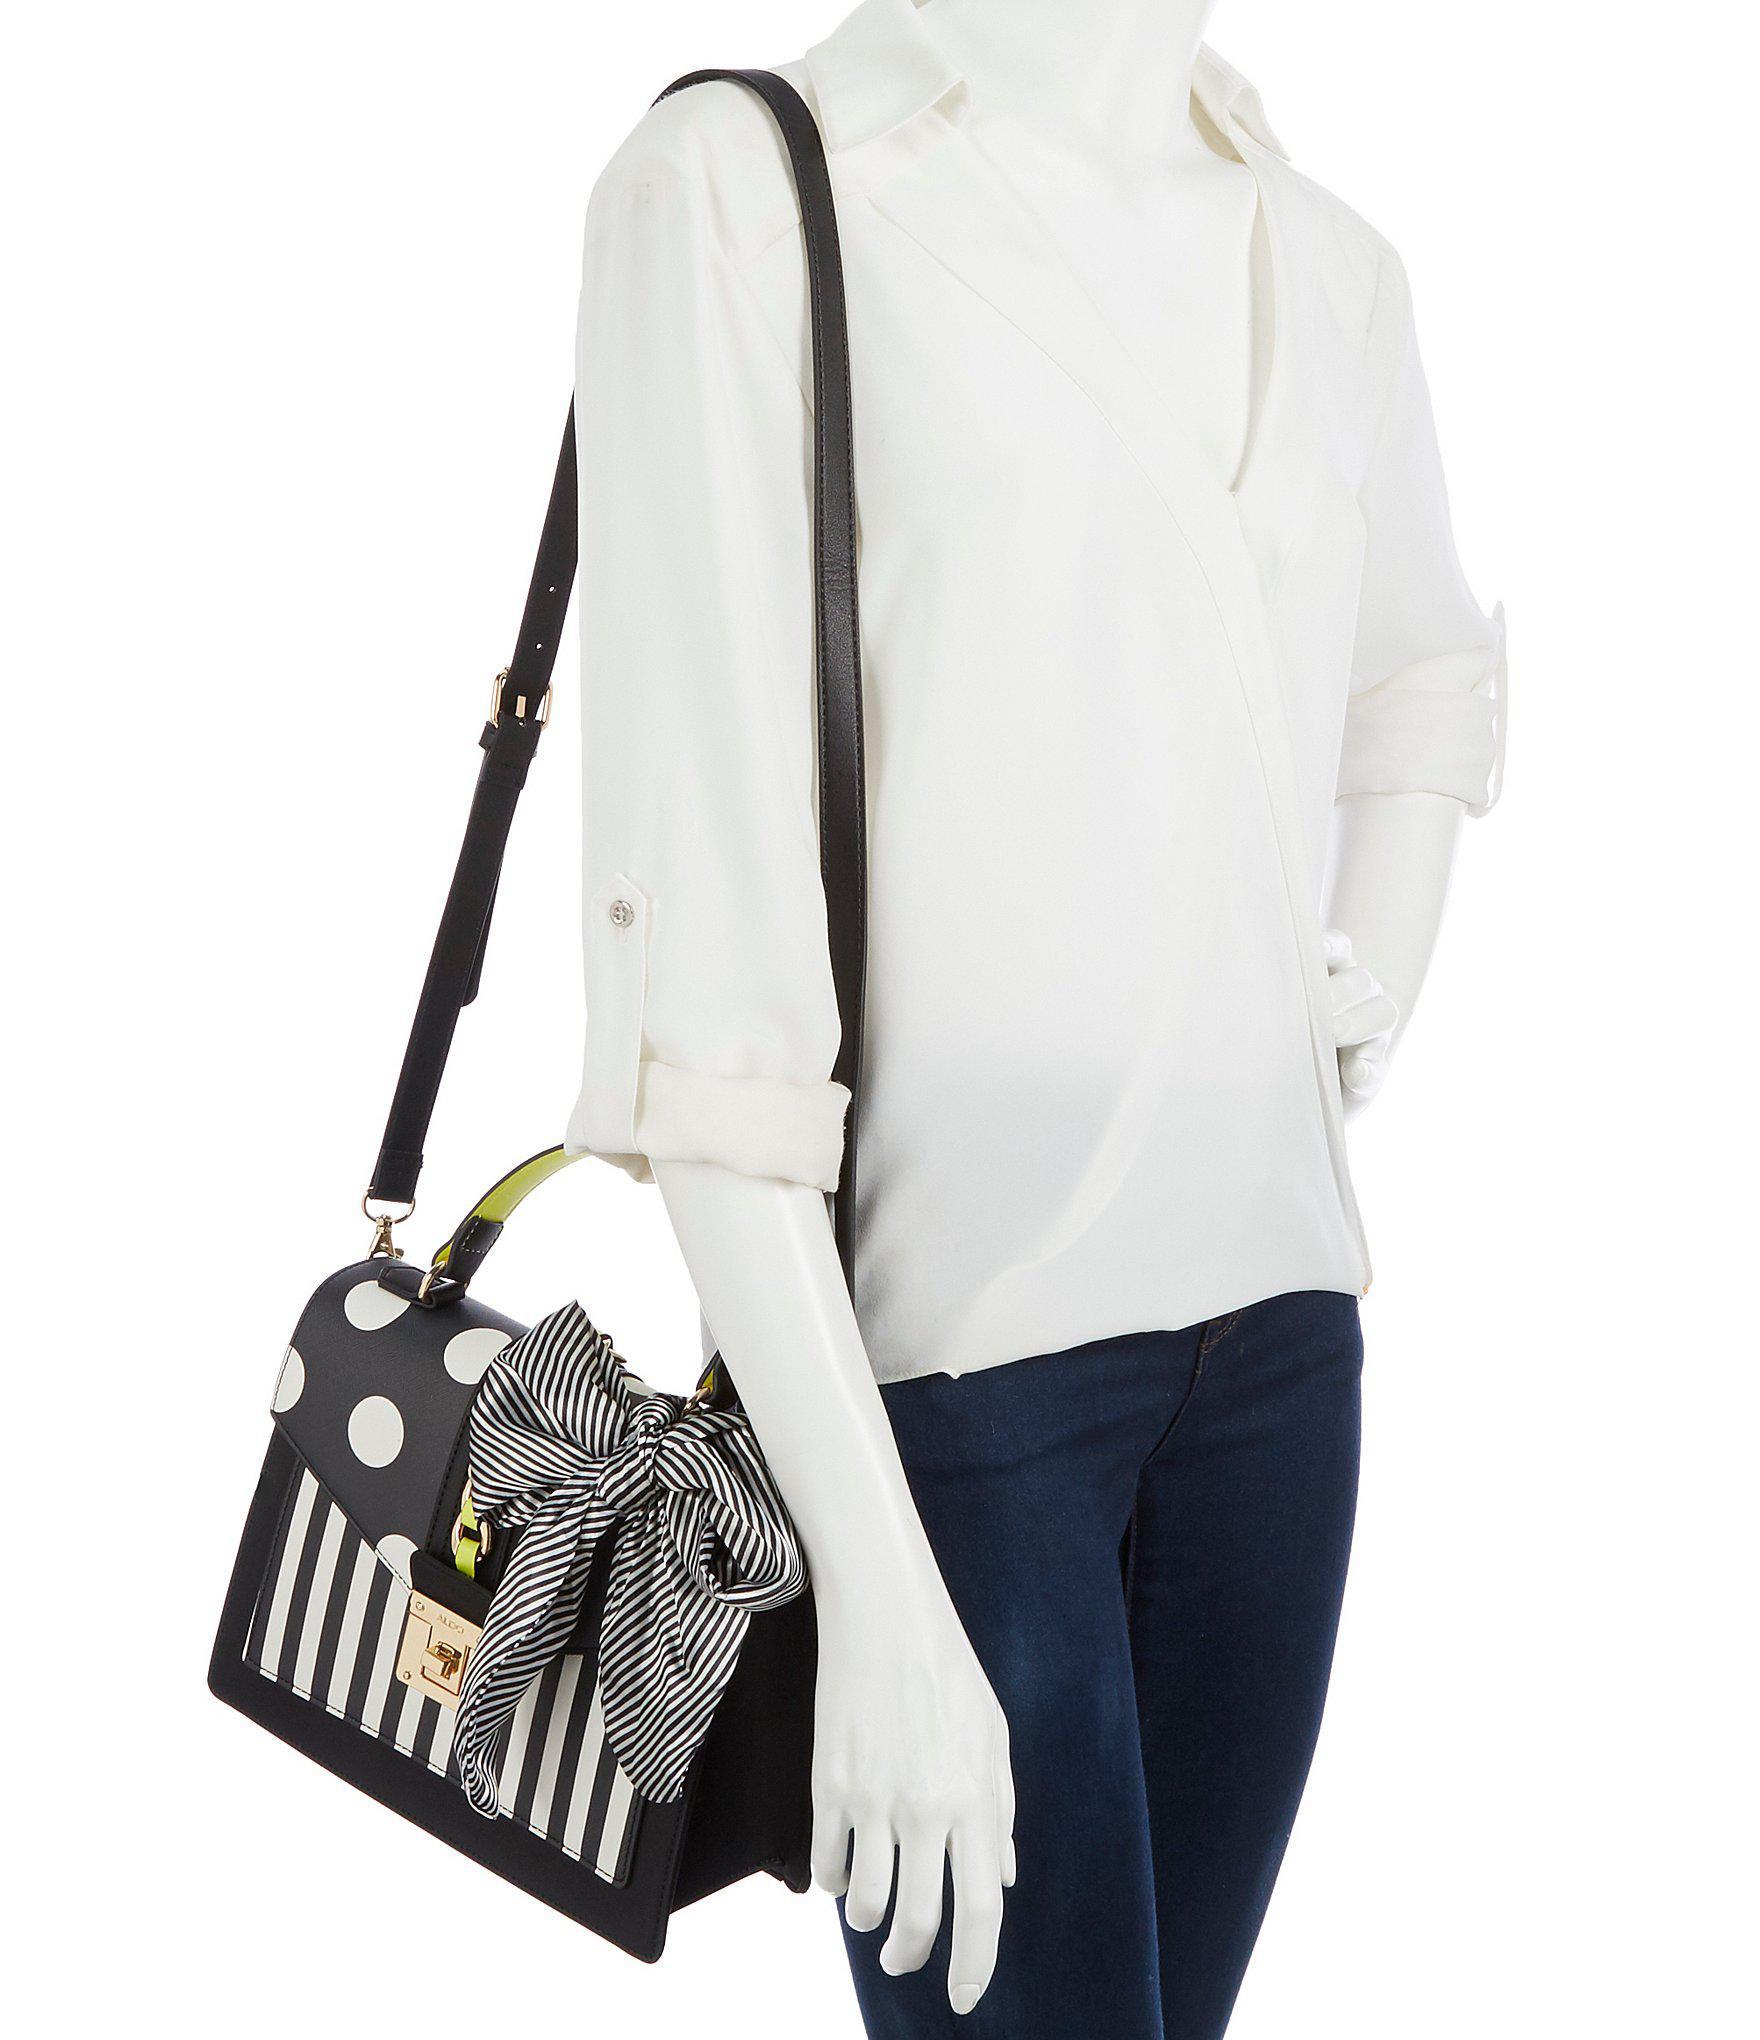 ab296df6ed Lyst - ALDO Glendaa Small Top Handle Colorblock Handbag